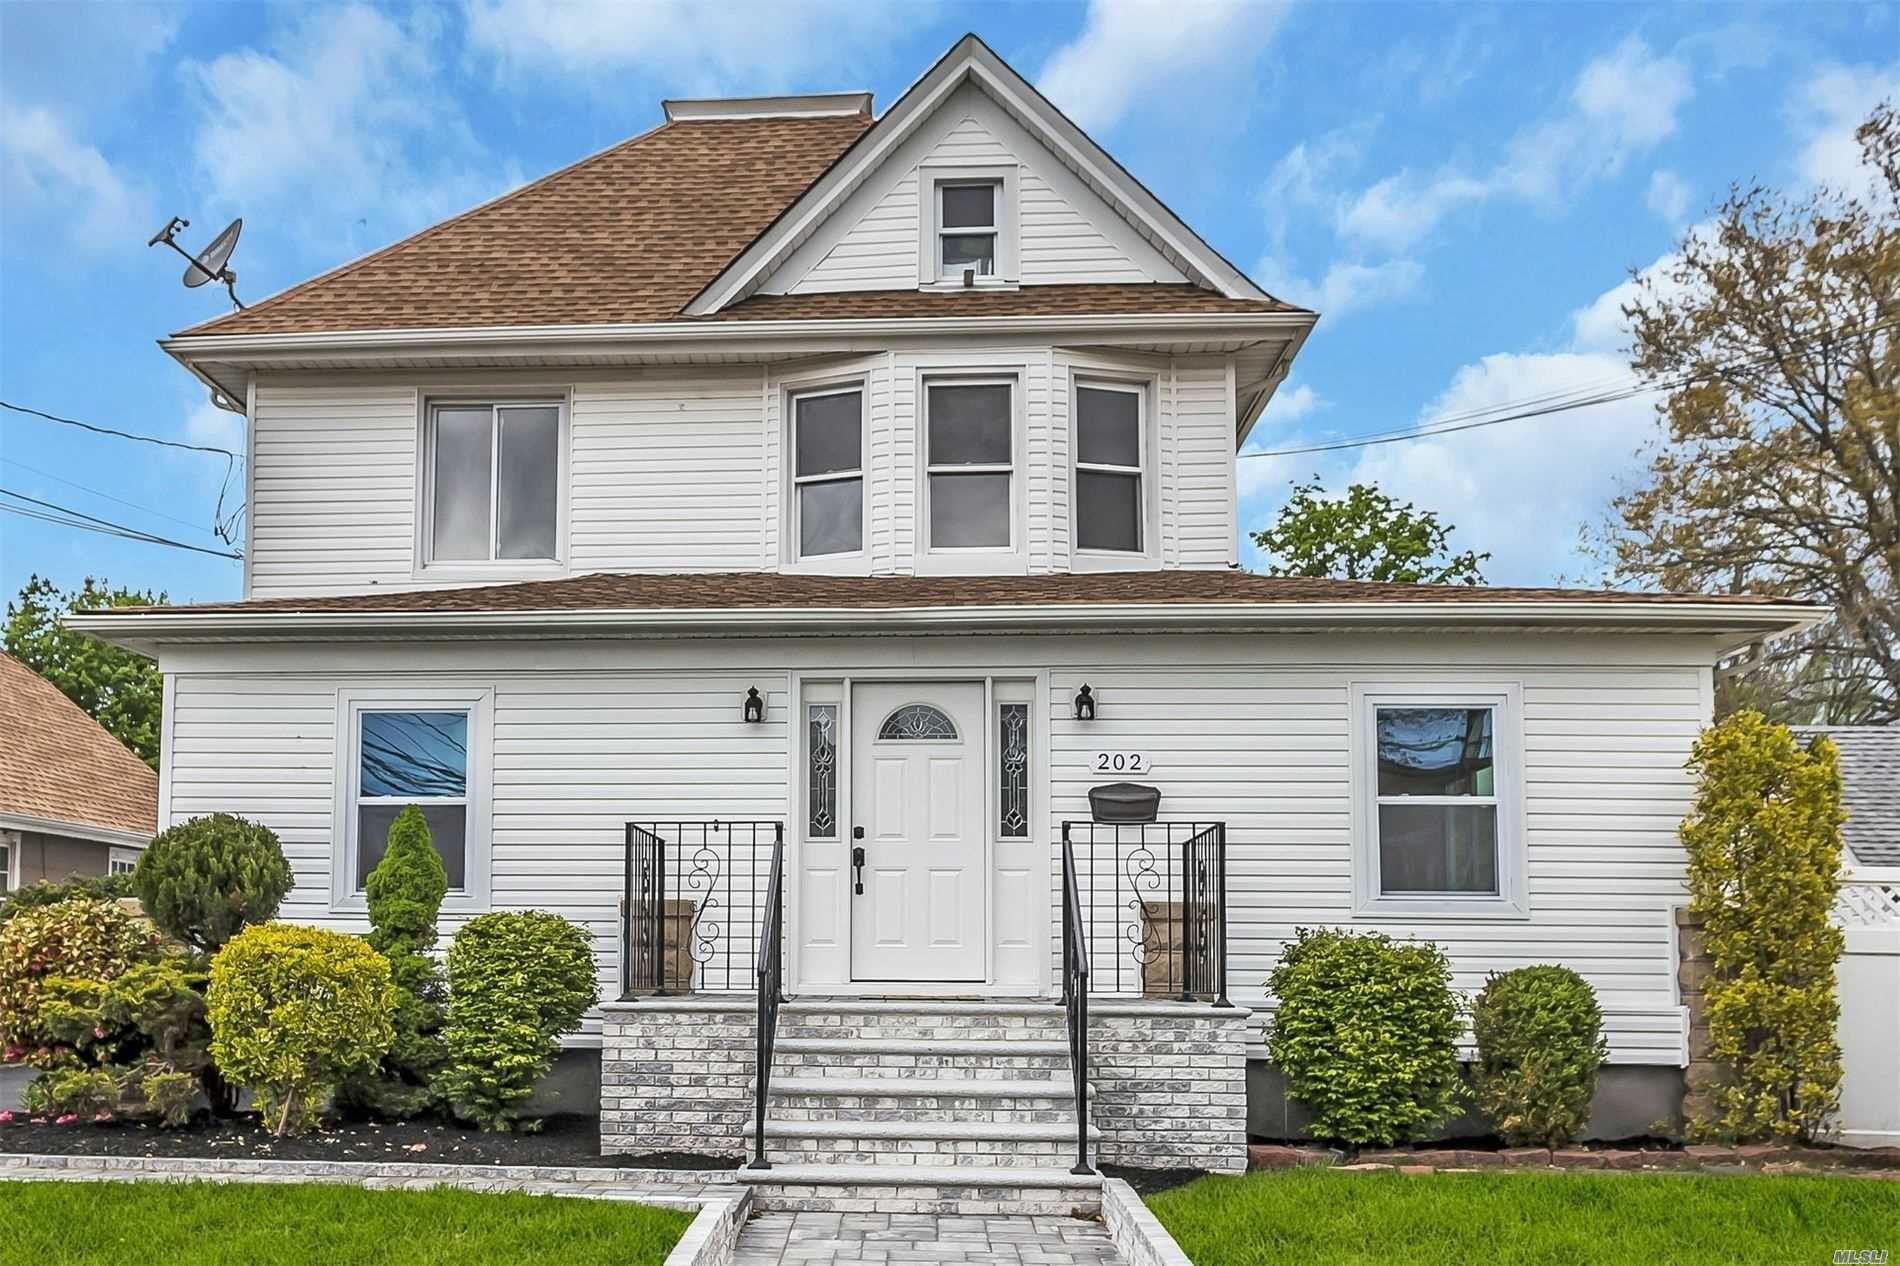 202 Porterfield Pl, Freeport, NY 11520 - MLS#: 3216363